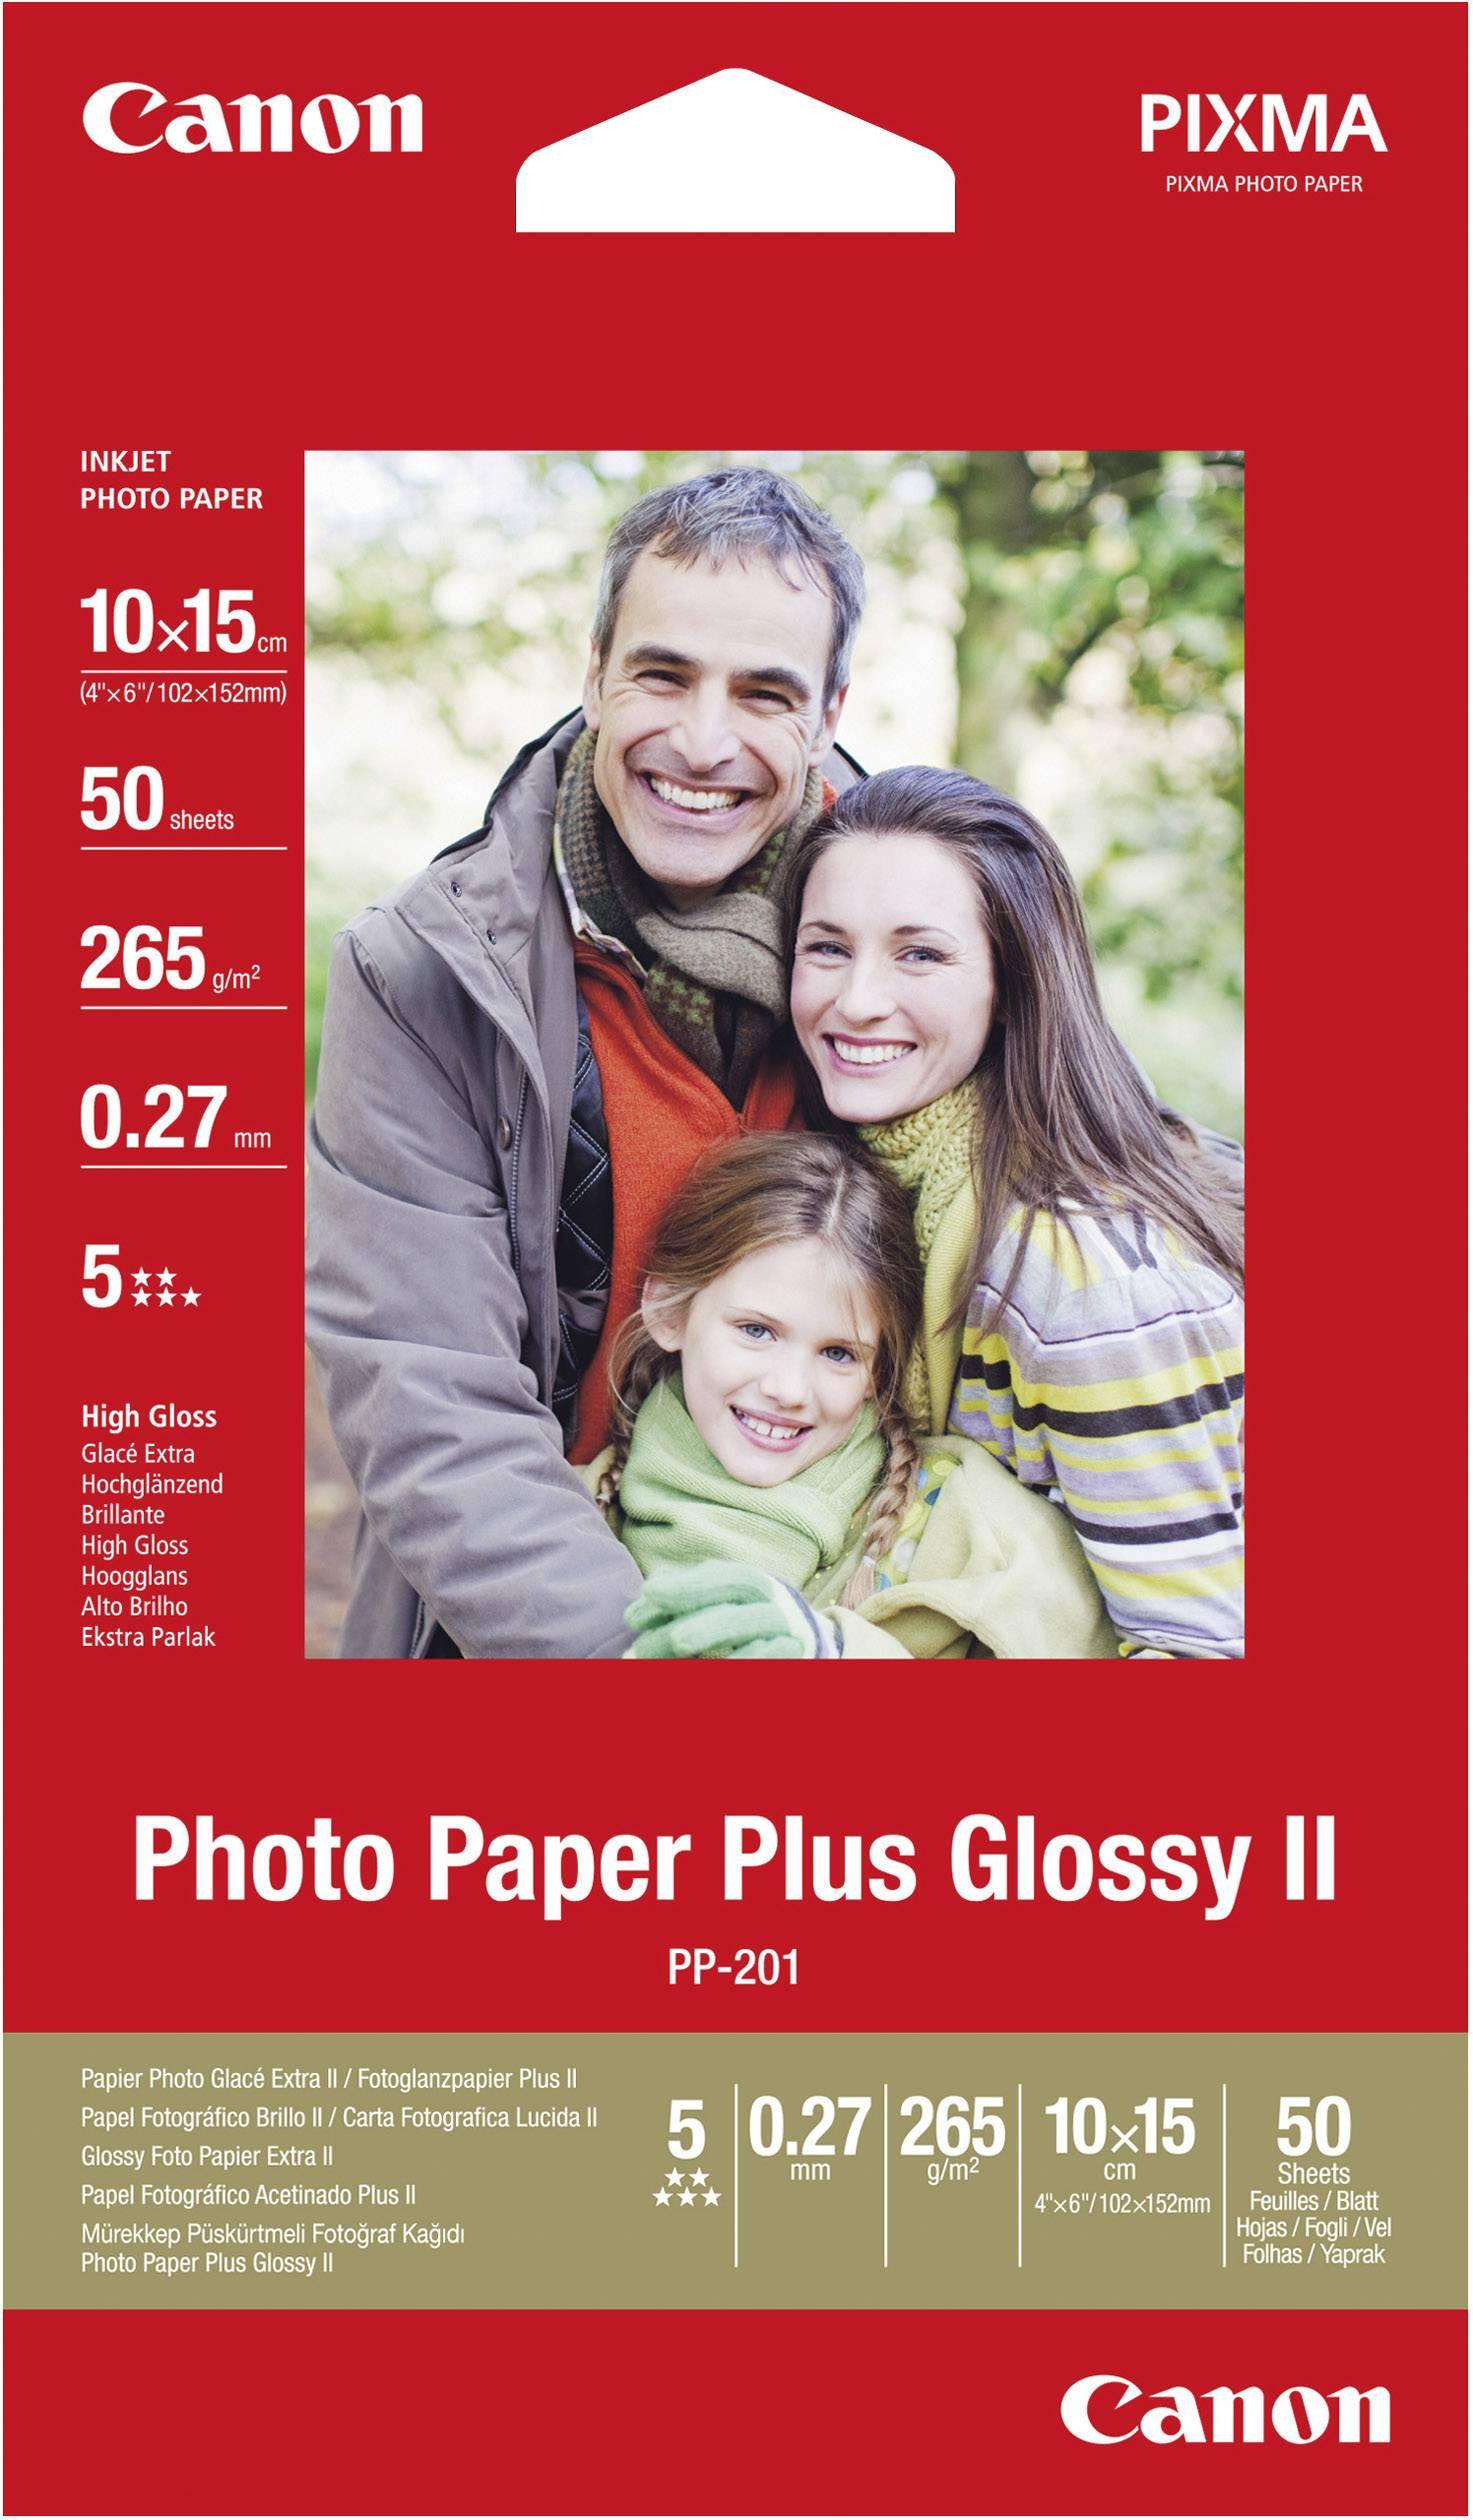 Fotografický papier Canon Photo Paper Plus PP-201 2311B003, 10 x 15 cm, 265 gm², 50 listov